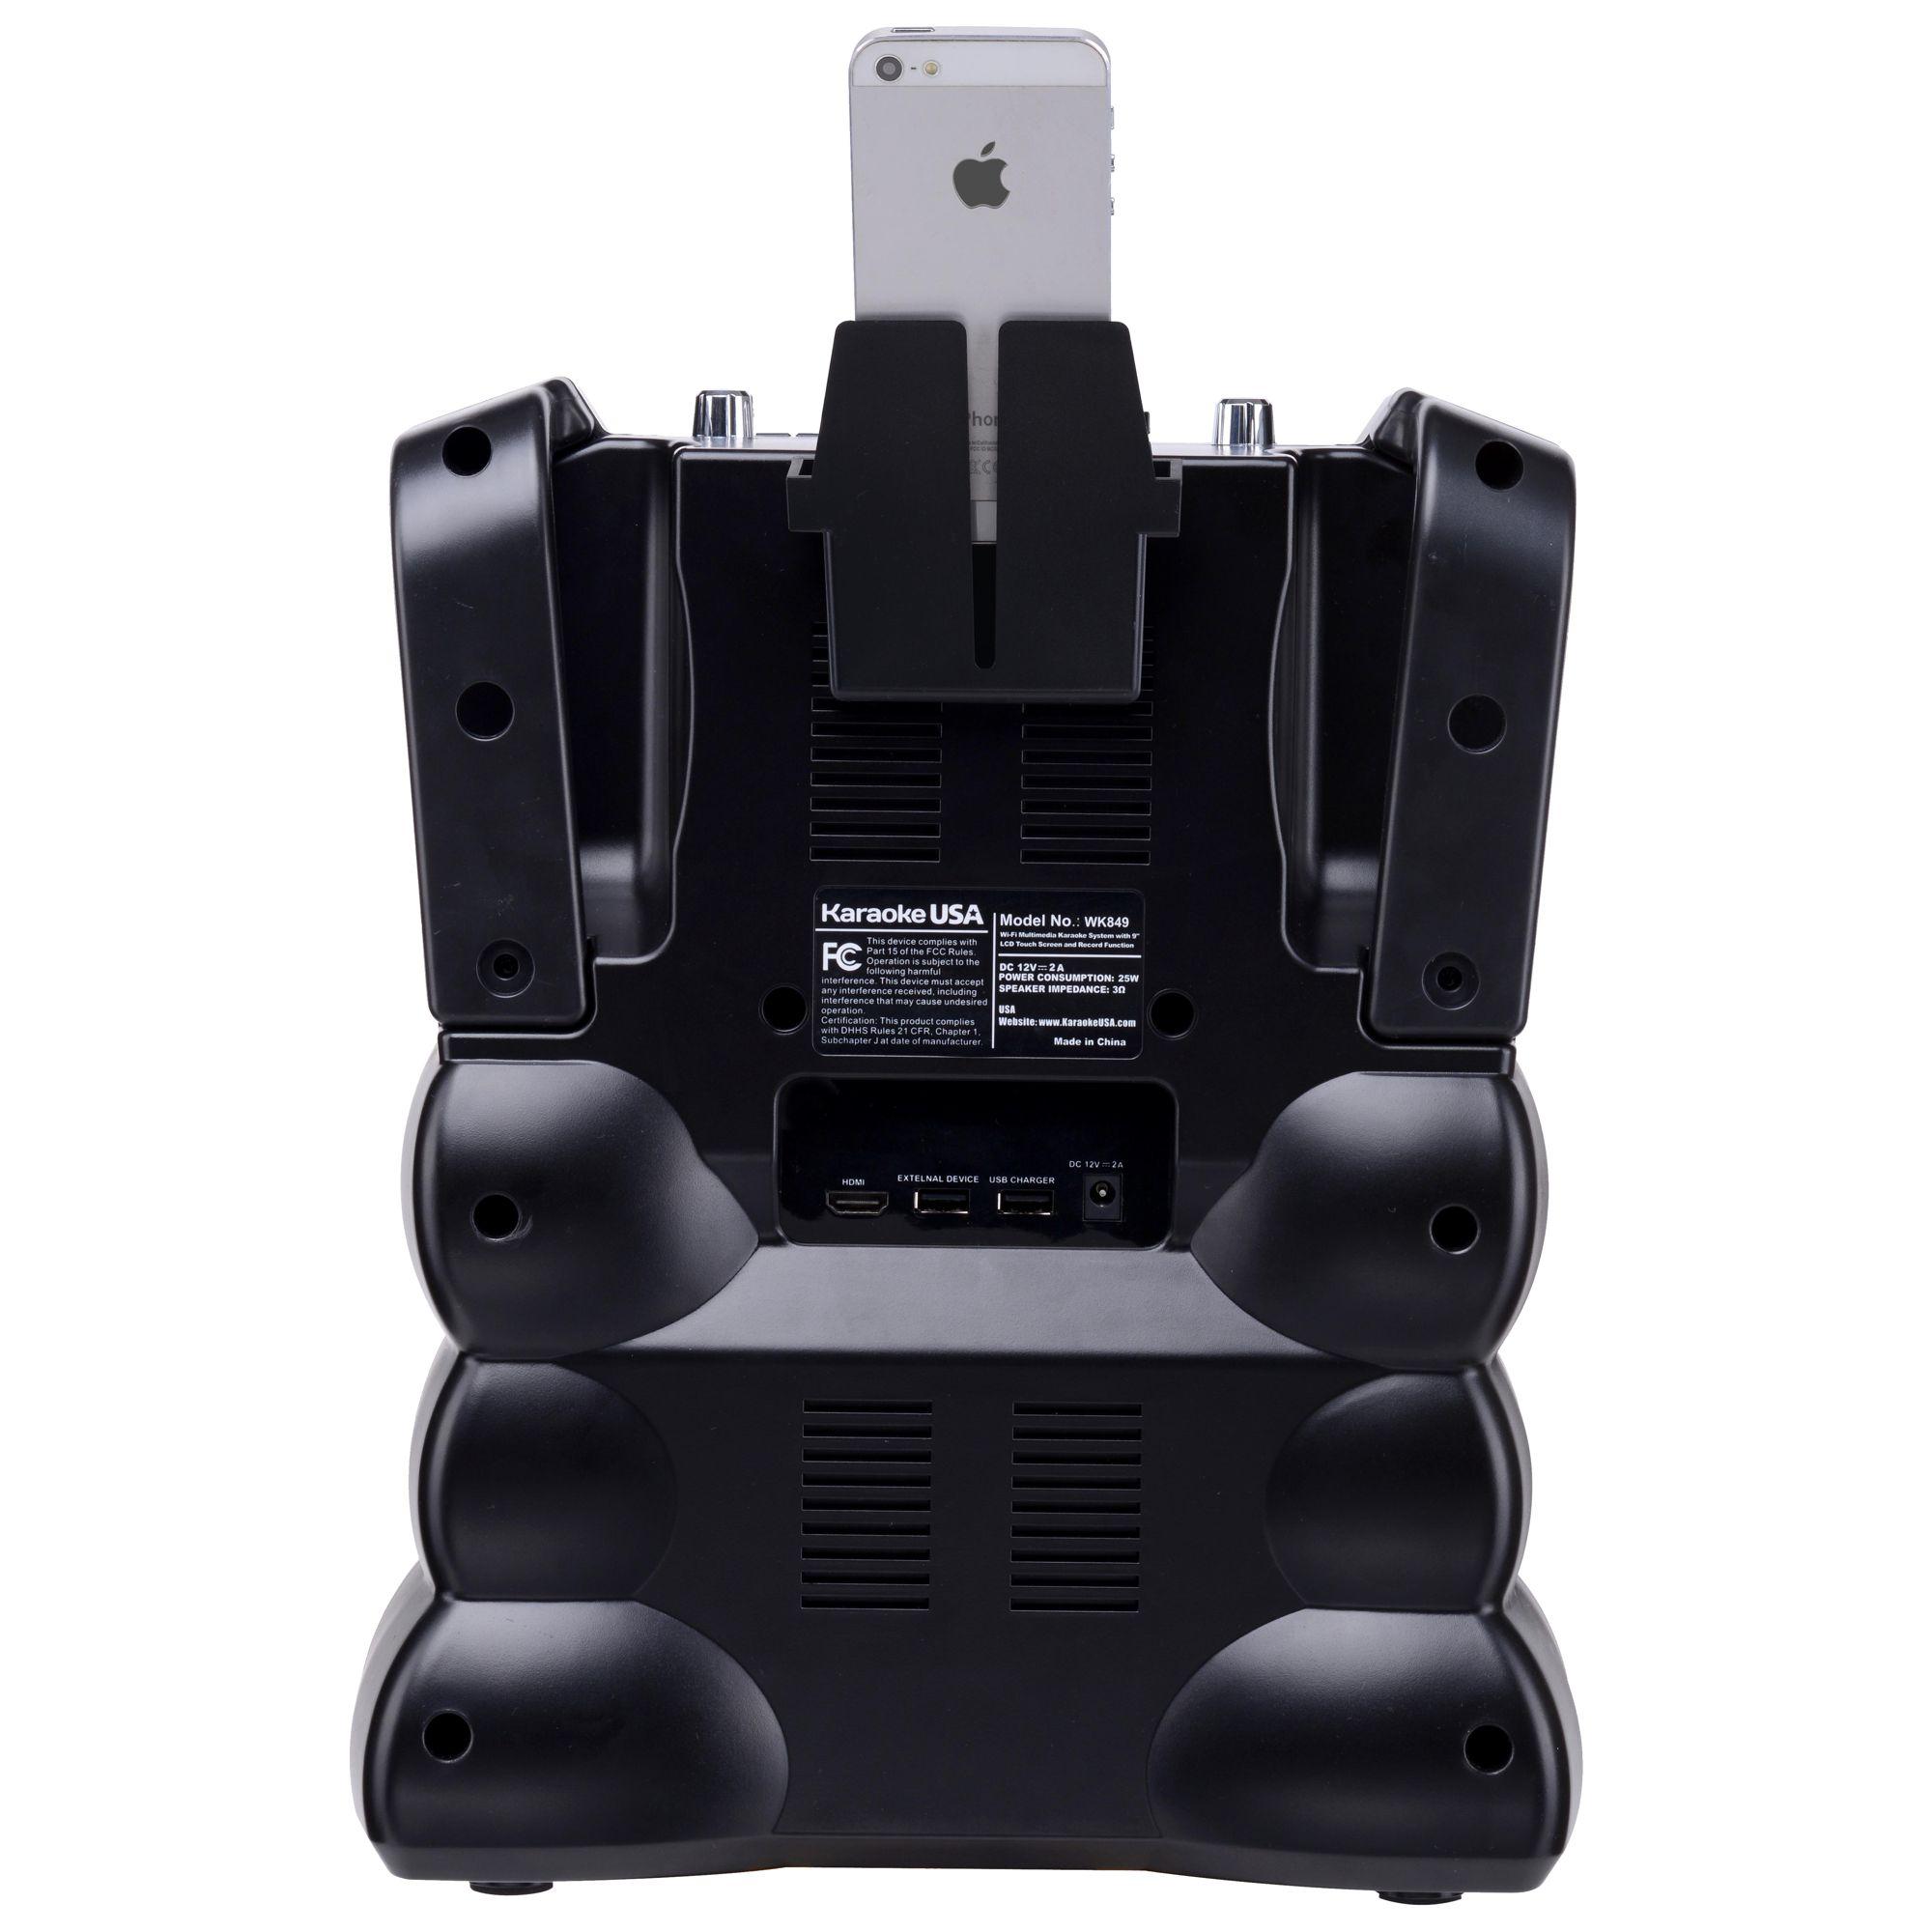 WK849 Complete Wi-Fi Bluetooth Karaoke Machine with 9